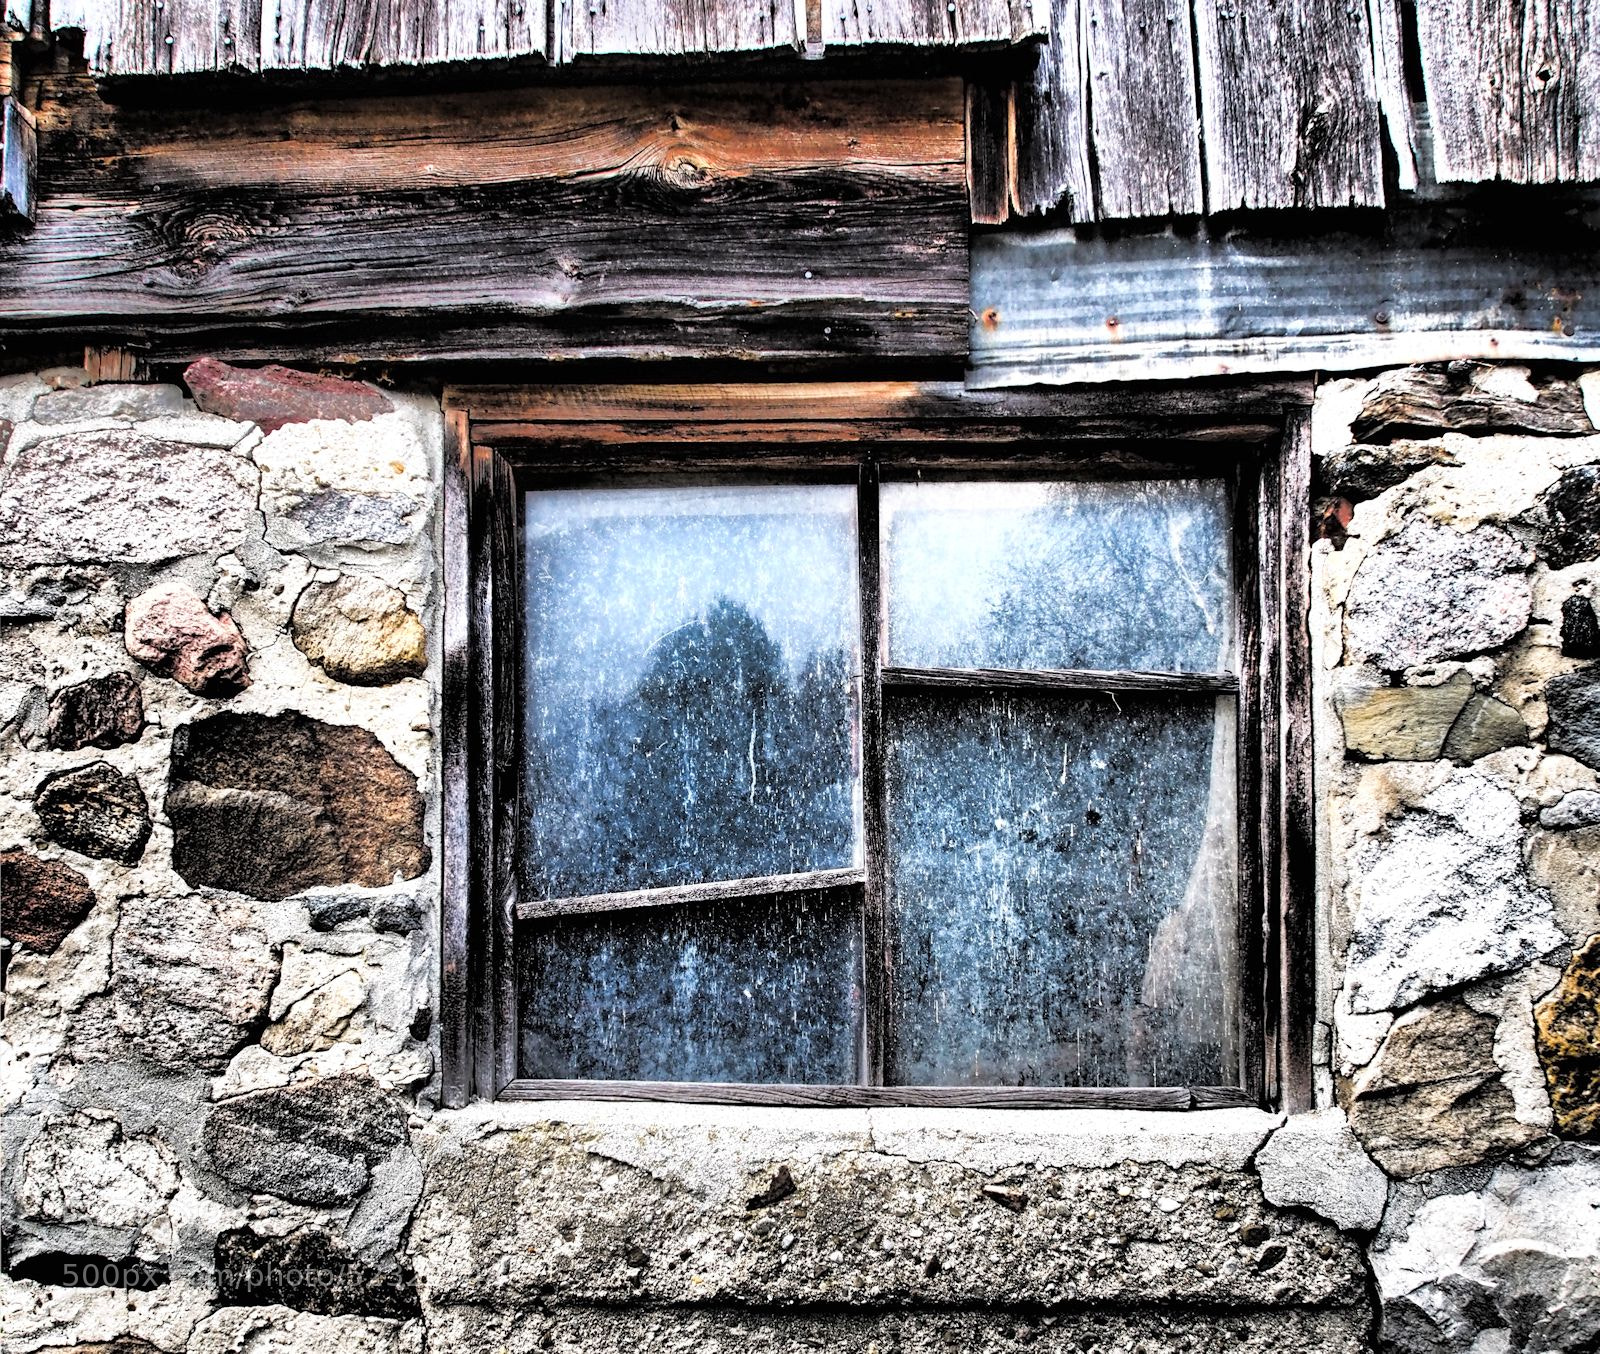 Photograph Barn Window by Grant MacDonald on 500px